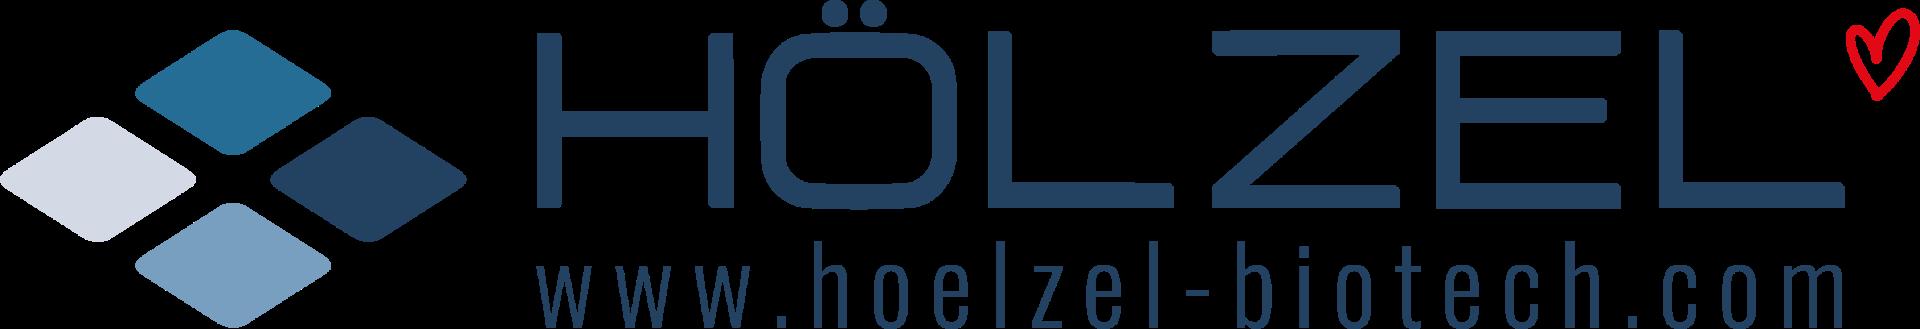 Hoelzel Diagnostika distributor of Cytoskeleton proteins and kits